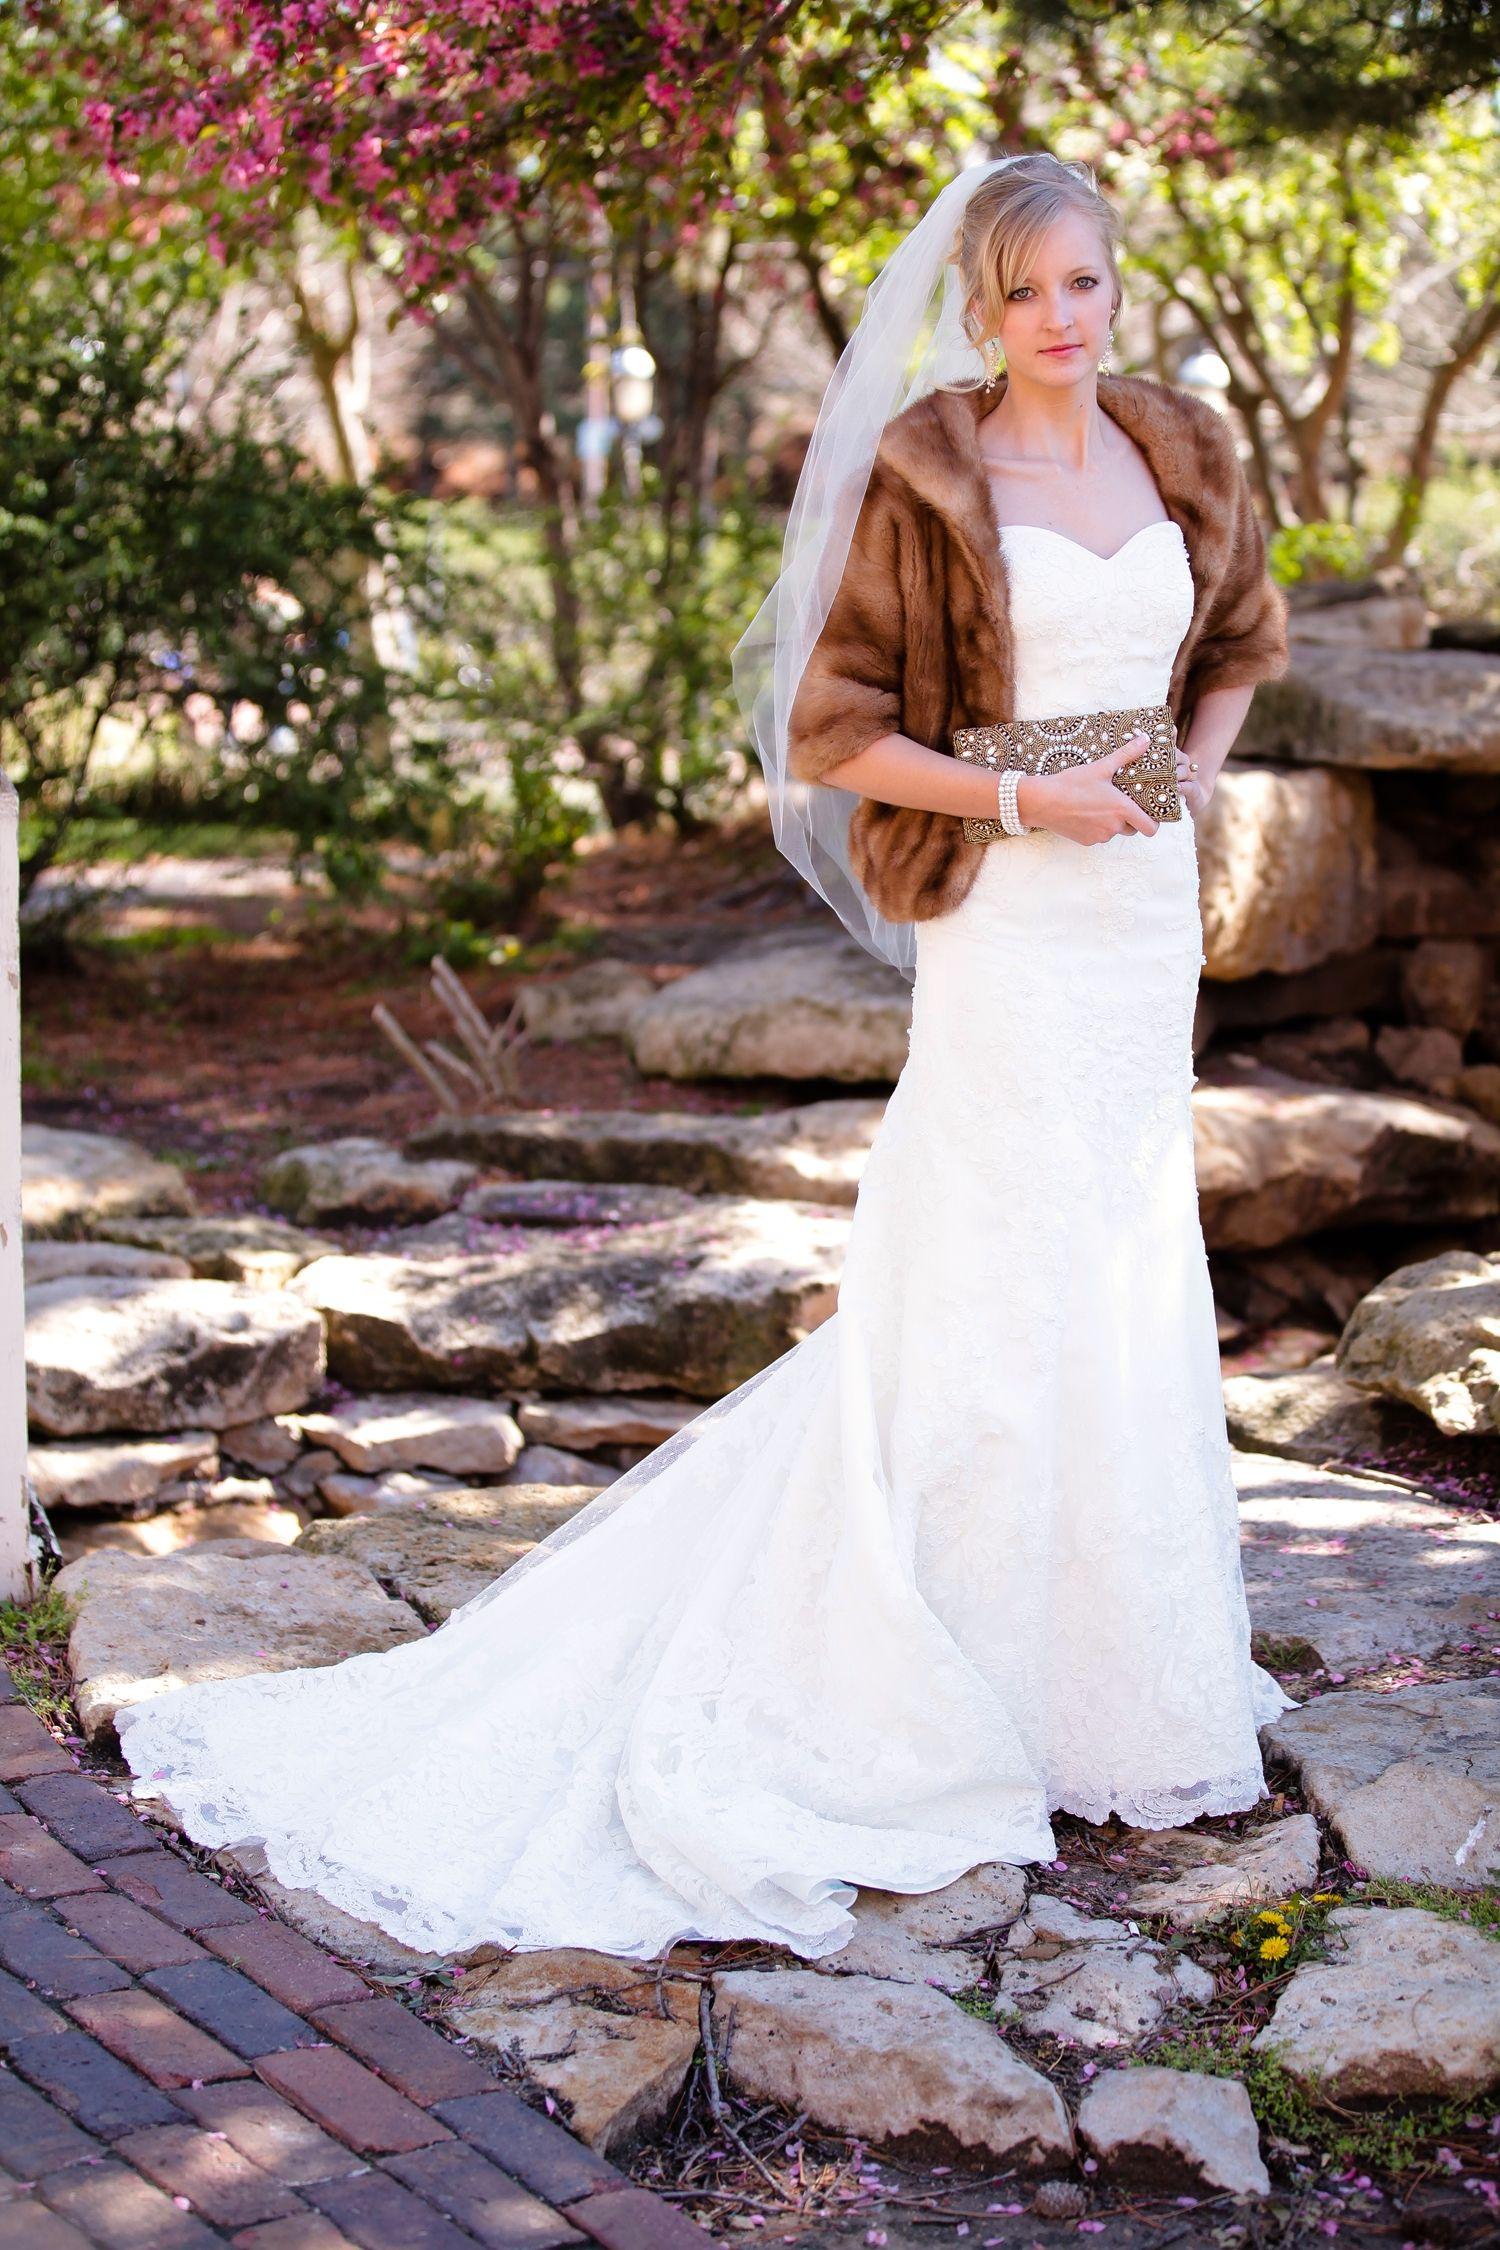 The dress gallery wichita kansas - Our Brides Wedding Dress Dress Gallery Bridal Wichita Ks